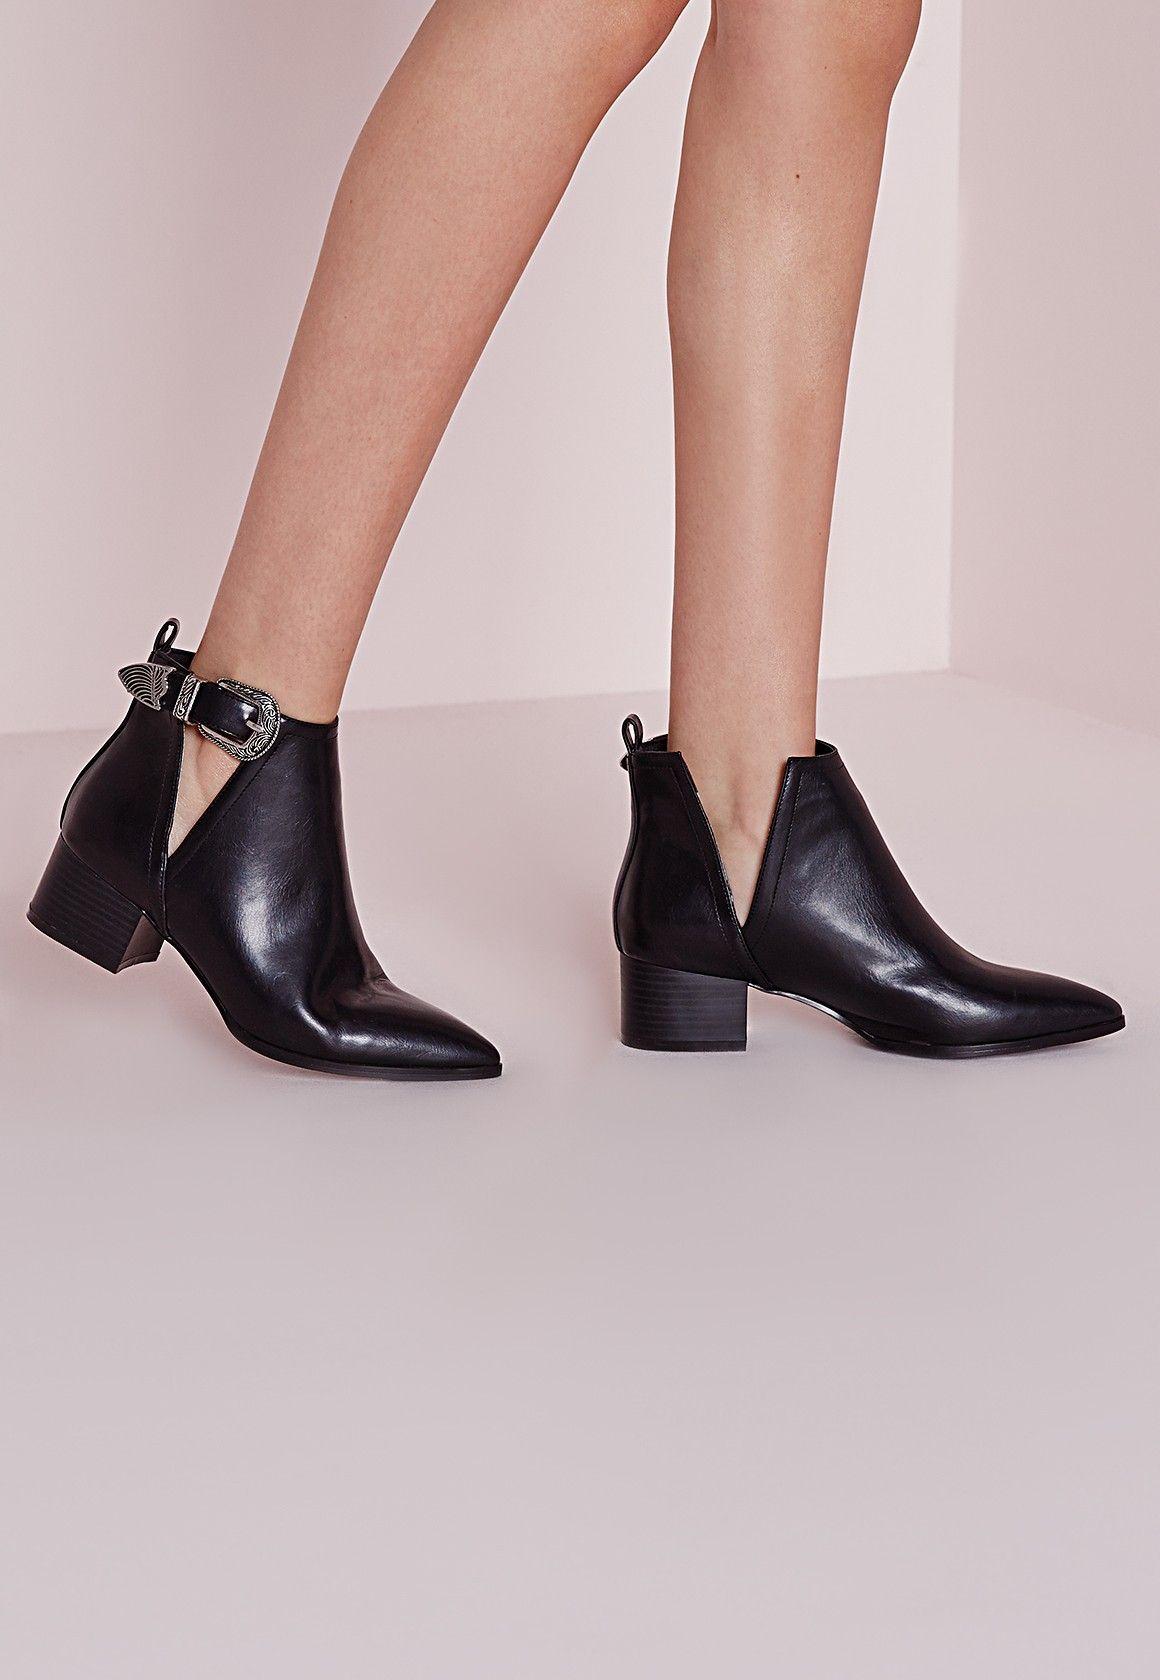 missguided - bottines noires pointues | pieces look | pinterest